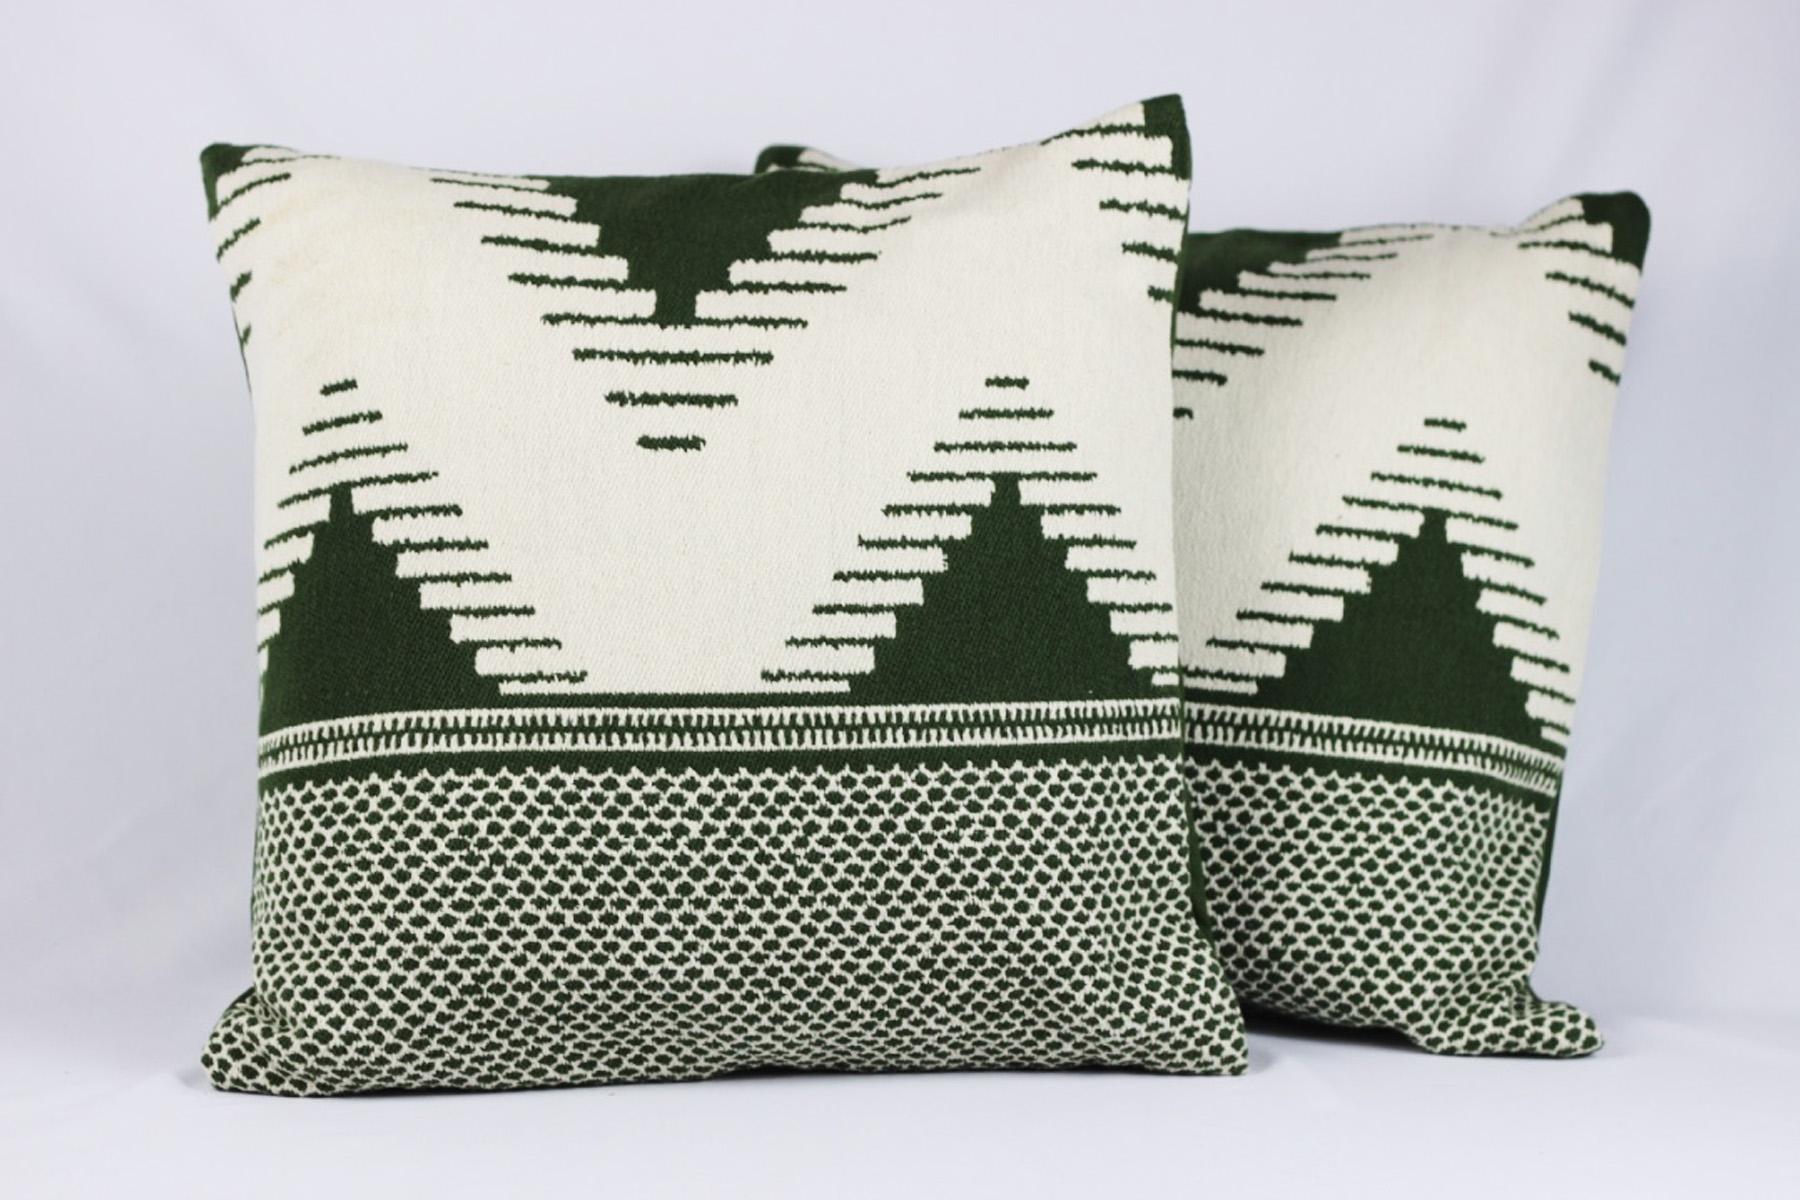 Azrael Pillows - Scavenged Vintage Rentals